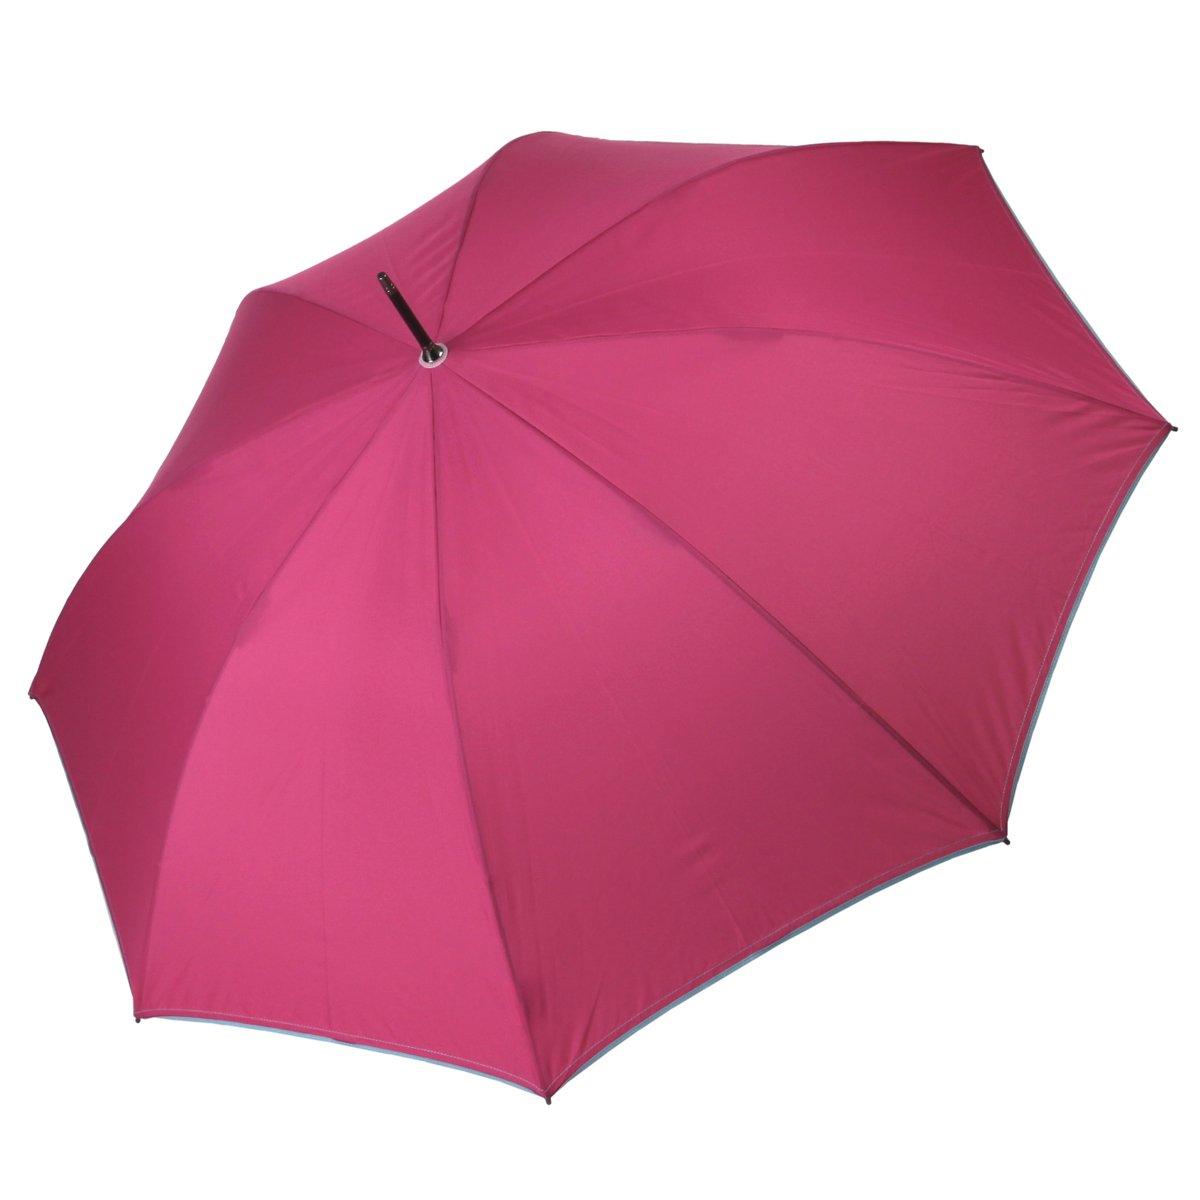 Stockschirm Damen Automatik Uni pink